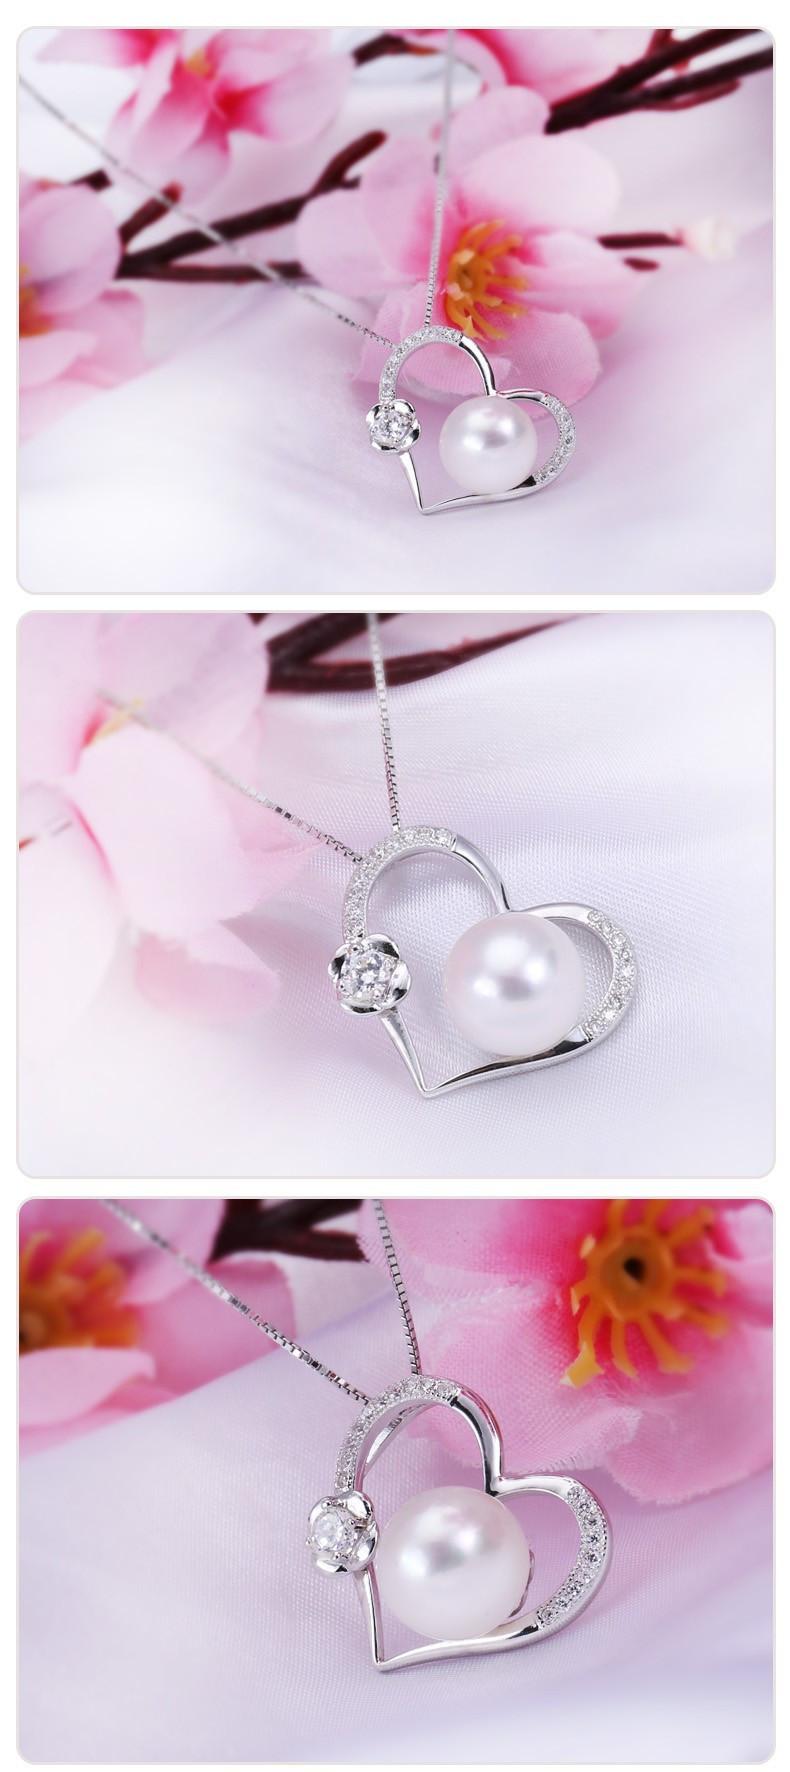 10-11mm Semi Round AAA Freshwater Heart Shape Jewelry Pearl Pendant